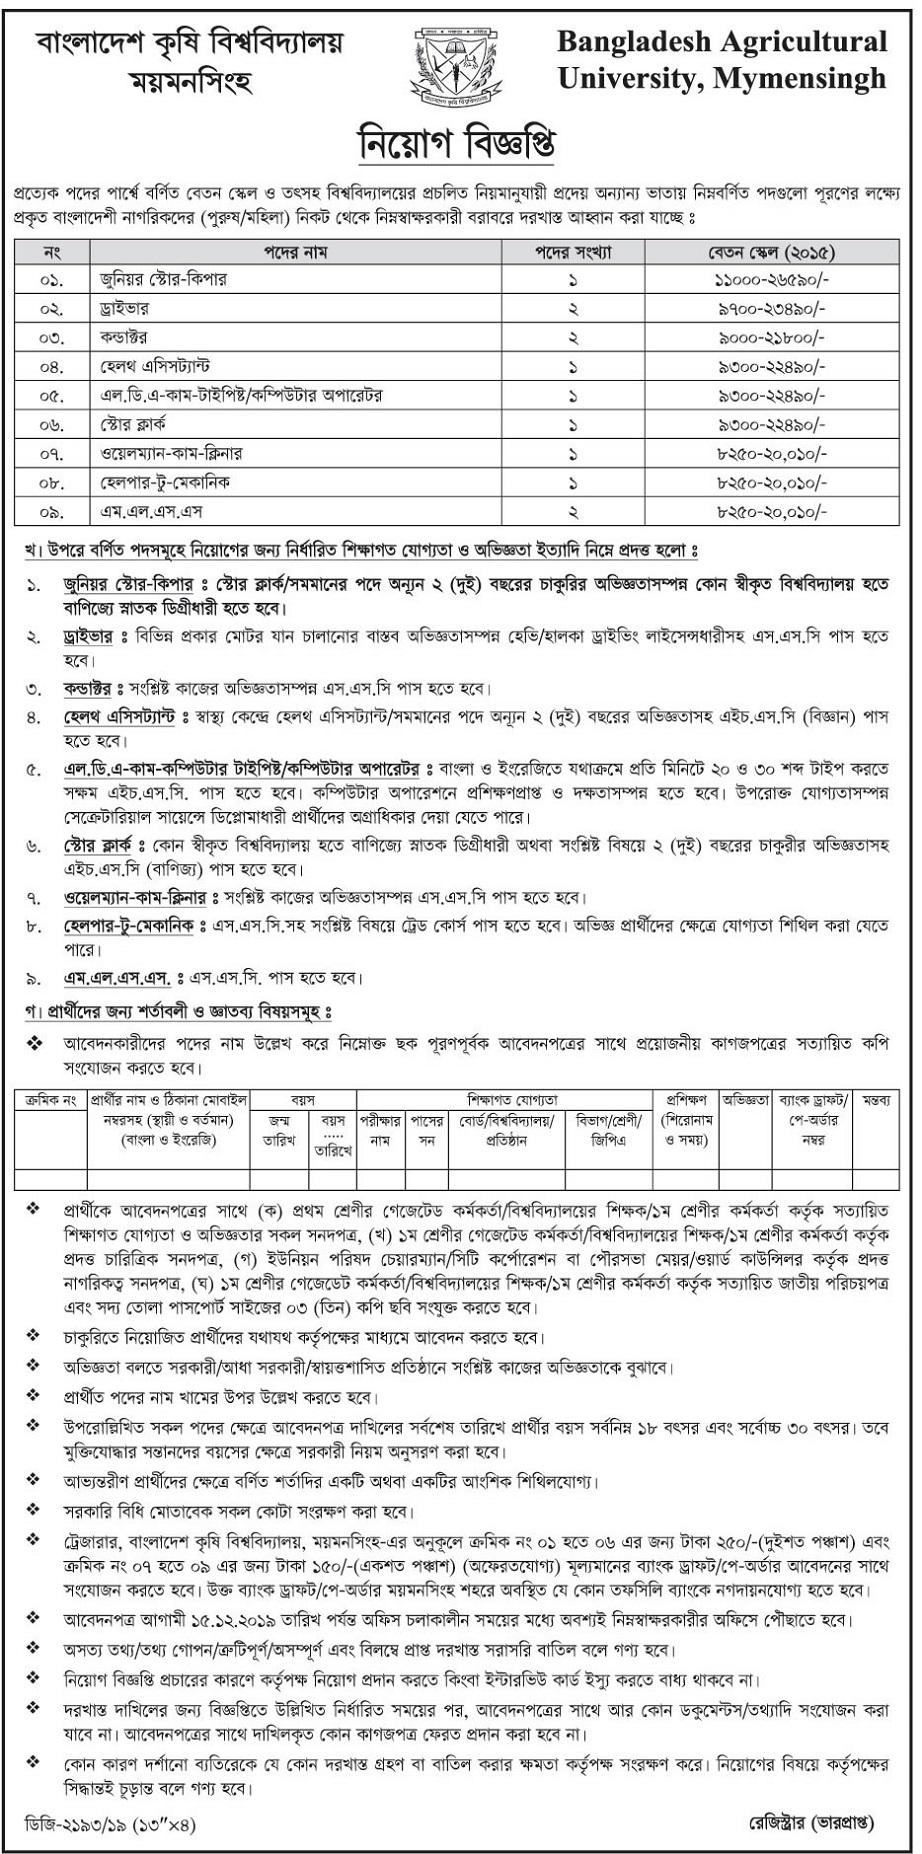 Bangladesh Agricultural University Job Circular 2019